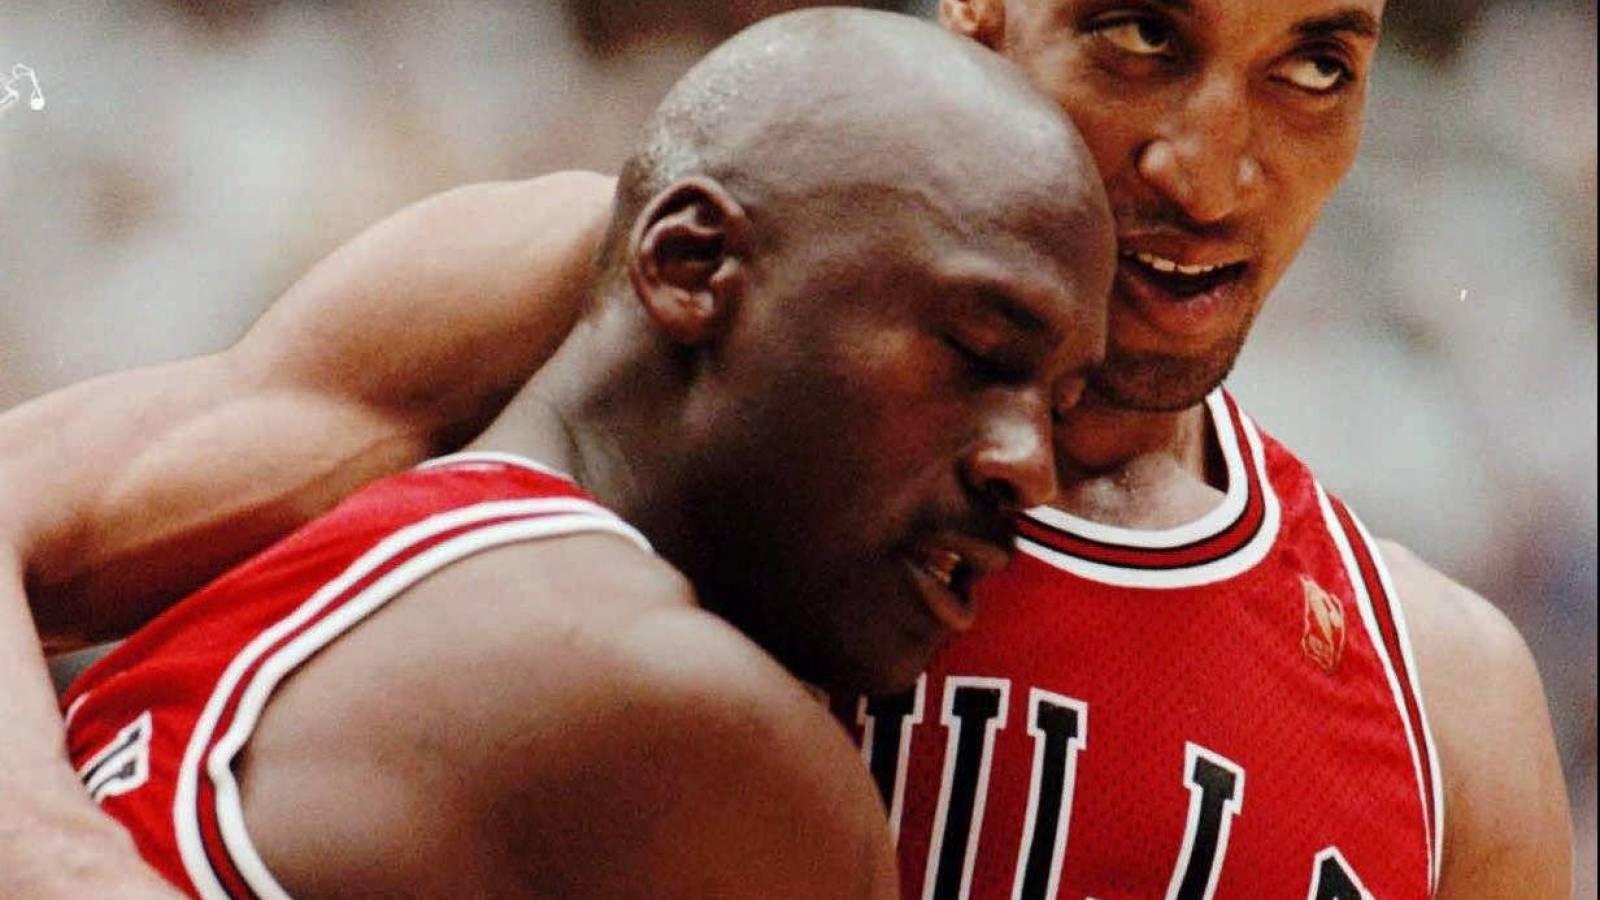 negro colorante Almeja  Was Michael Jordan actually hungover for famous 'flu game'? | Yardbarker